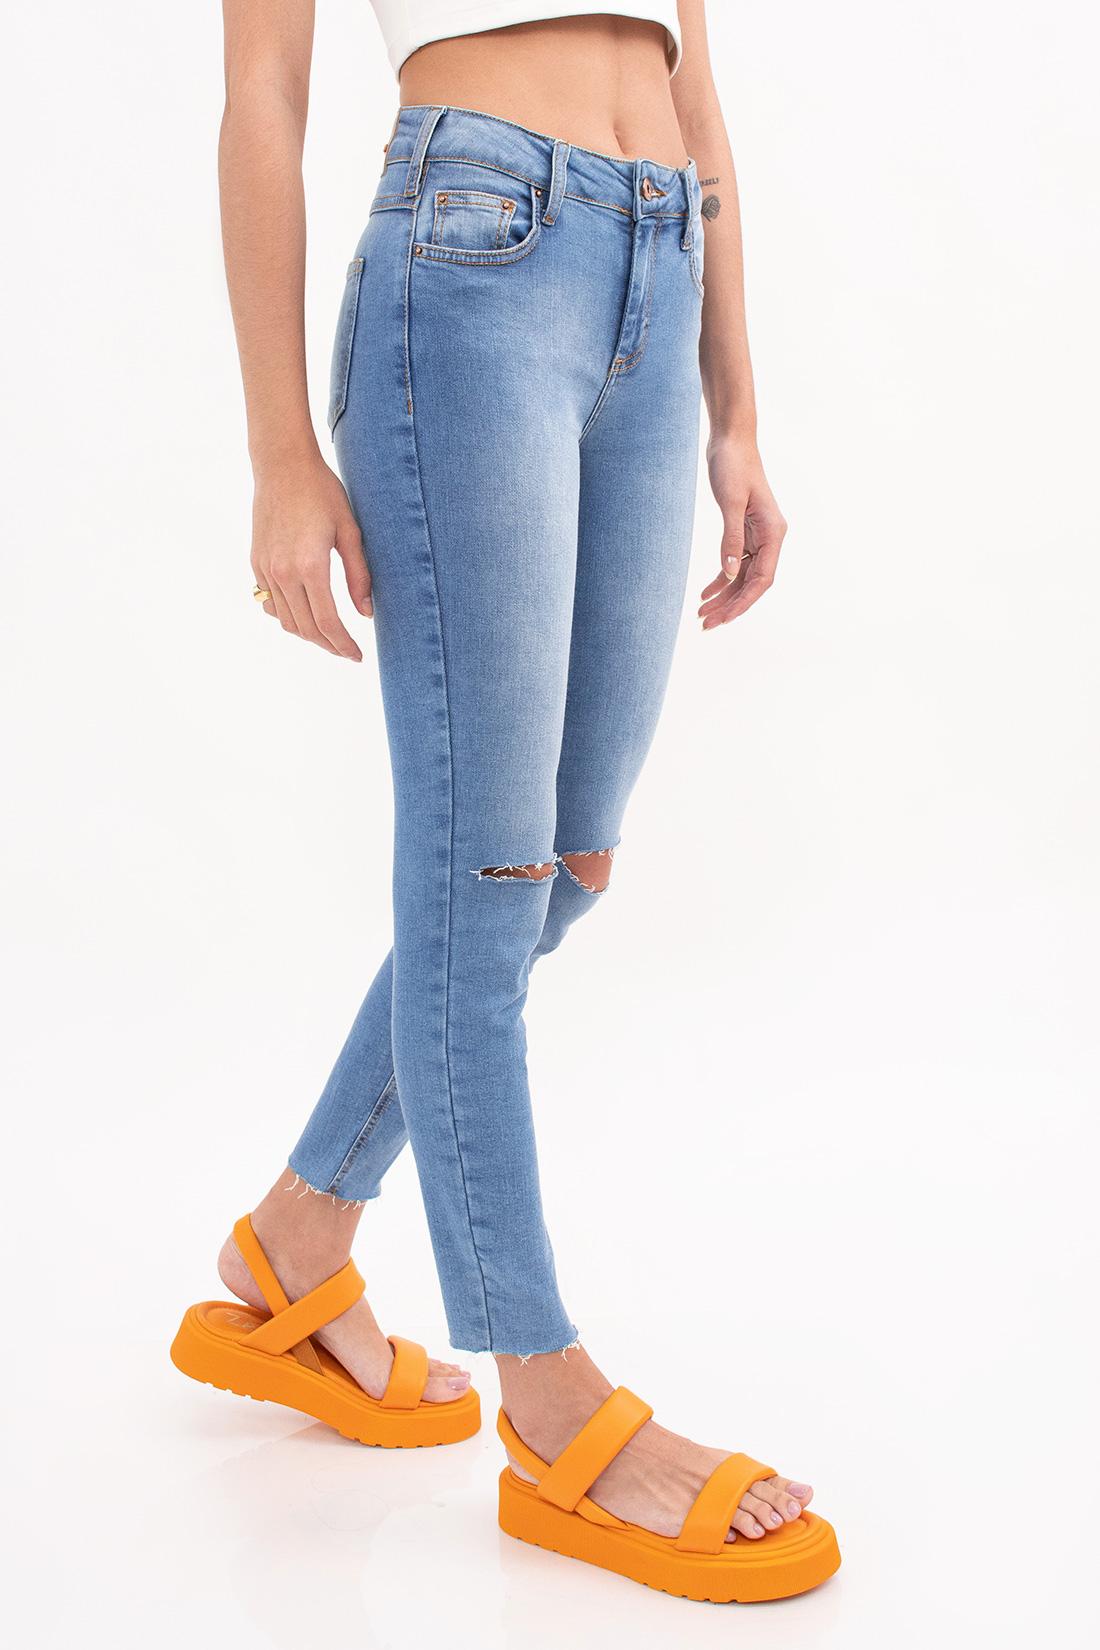 Calca Jeans Sommer Lia Cropped Corte Joelho